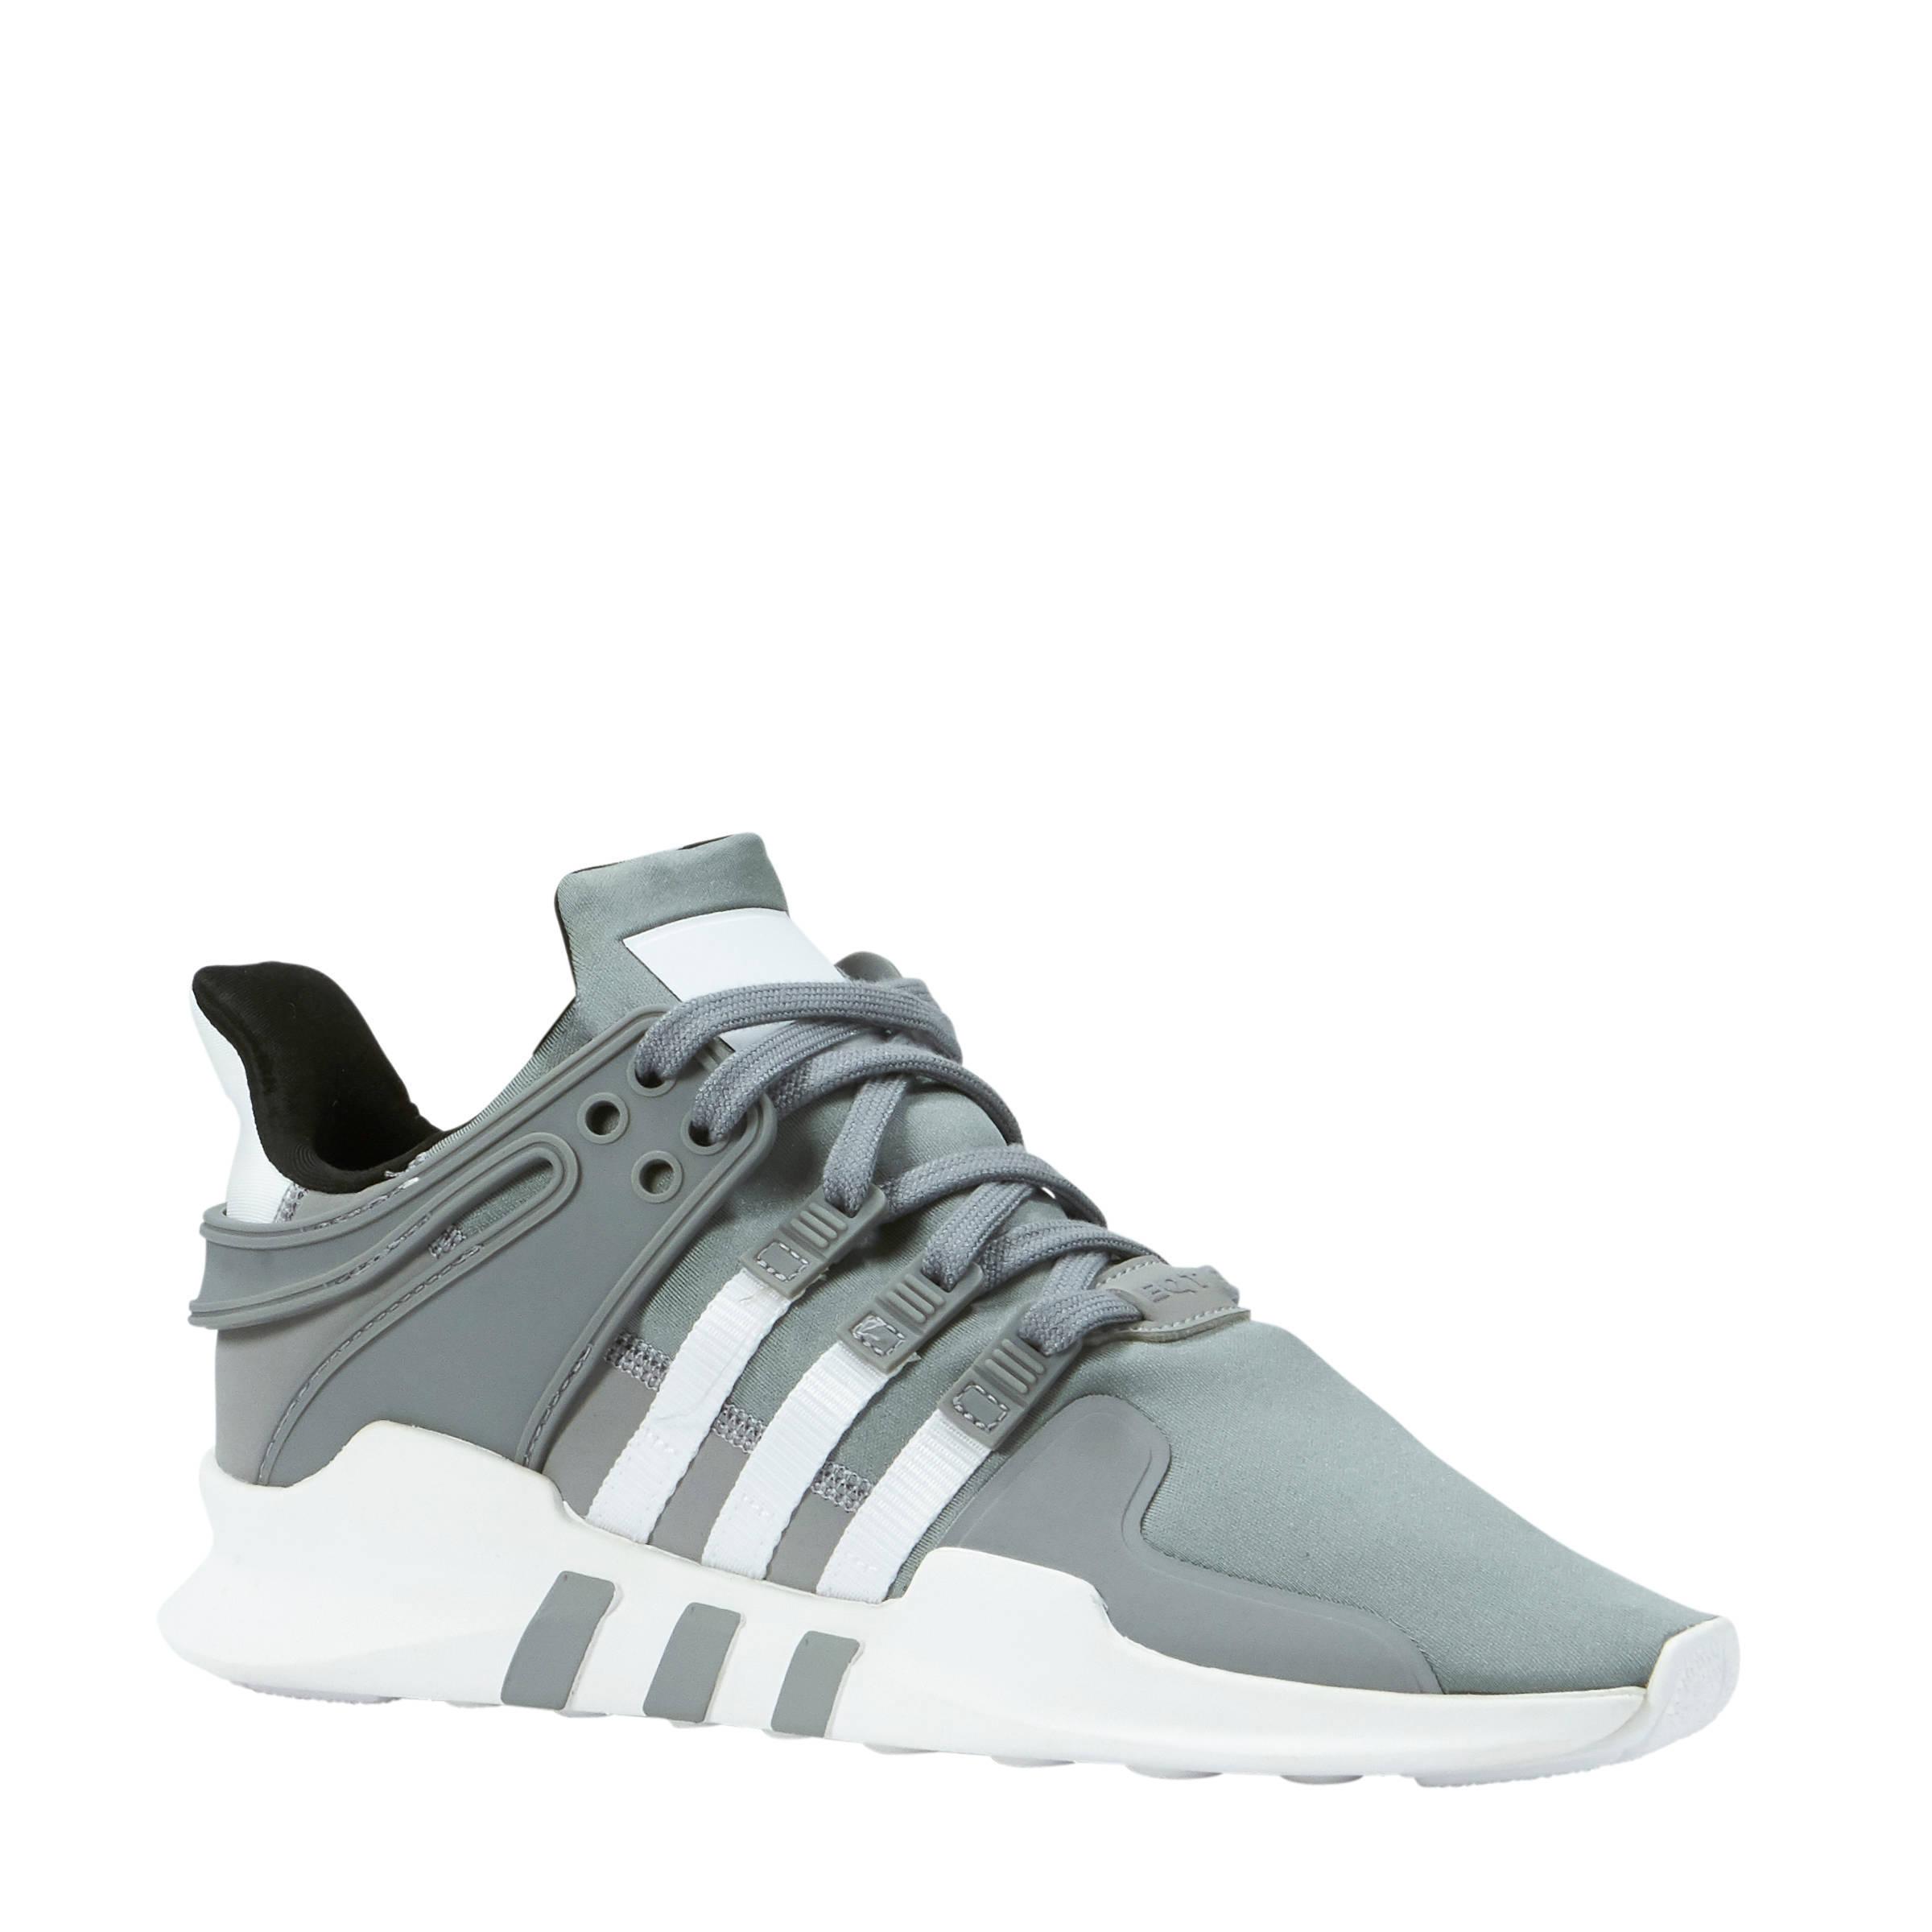 adidas Originals EQT Support ADV sneakers donkergroen   wehkamp